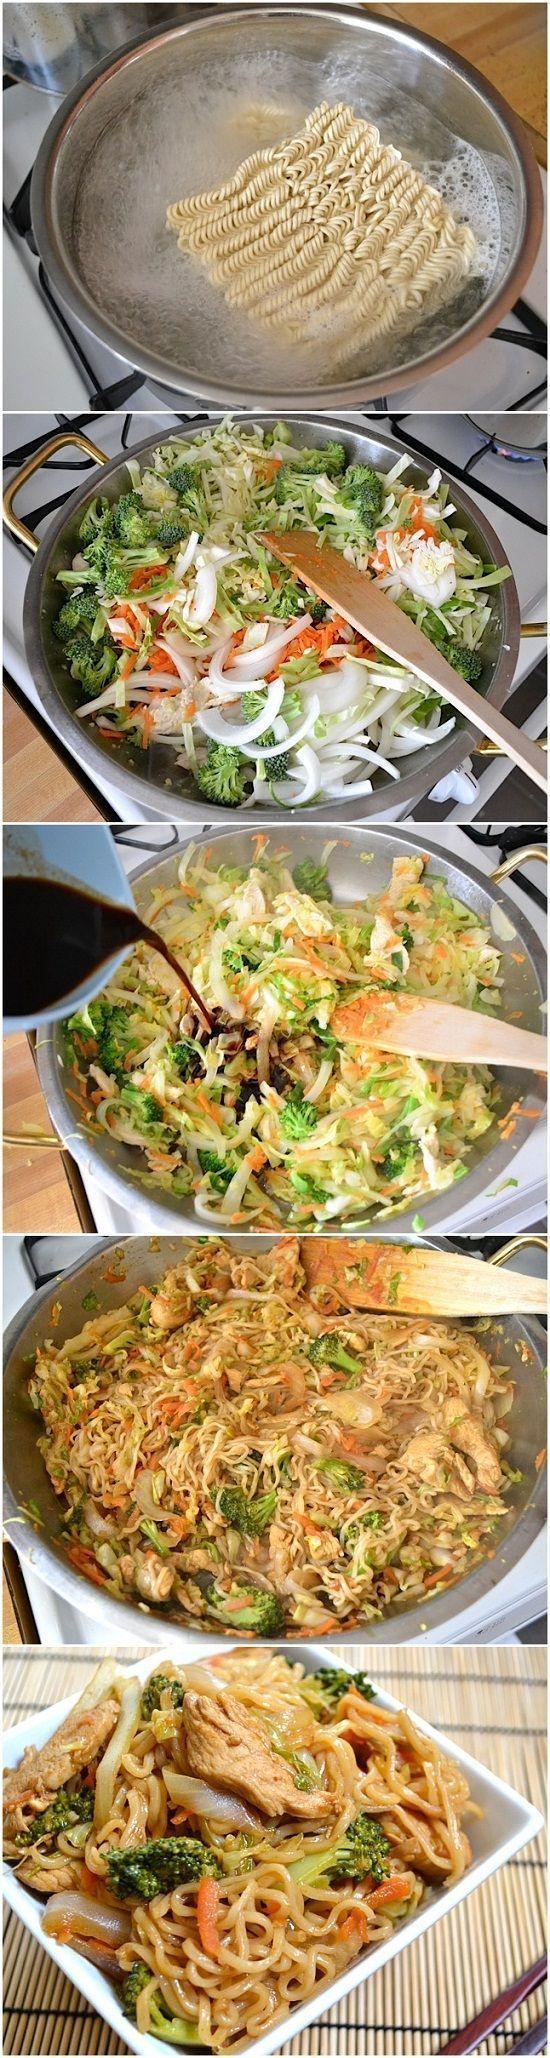 Easy Ramen Chicken Stir Fry